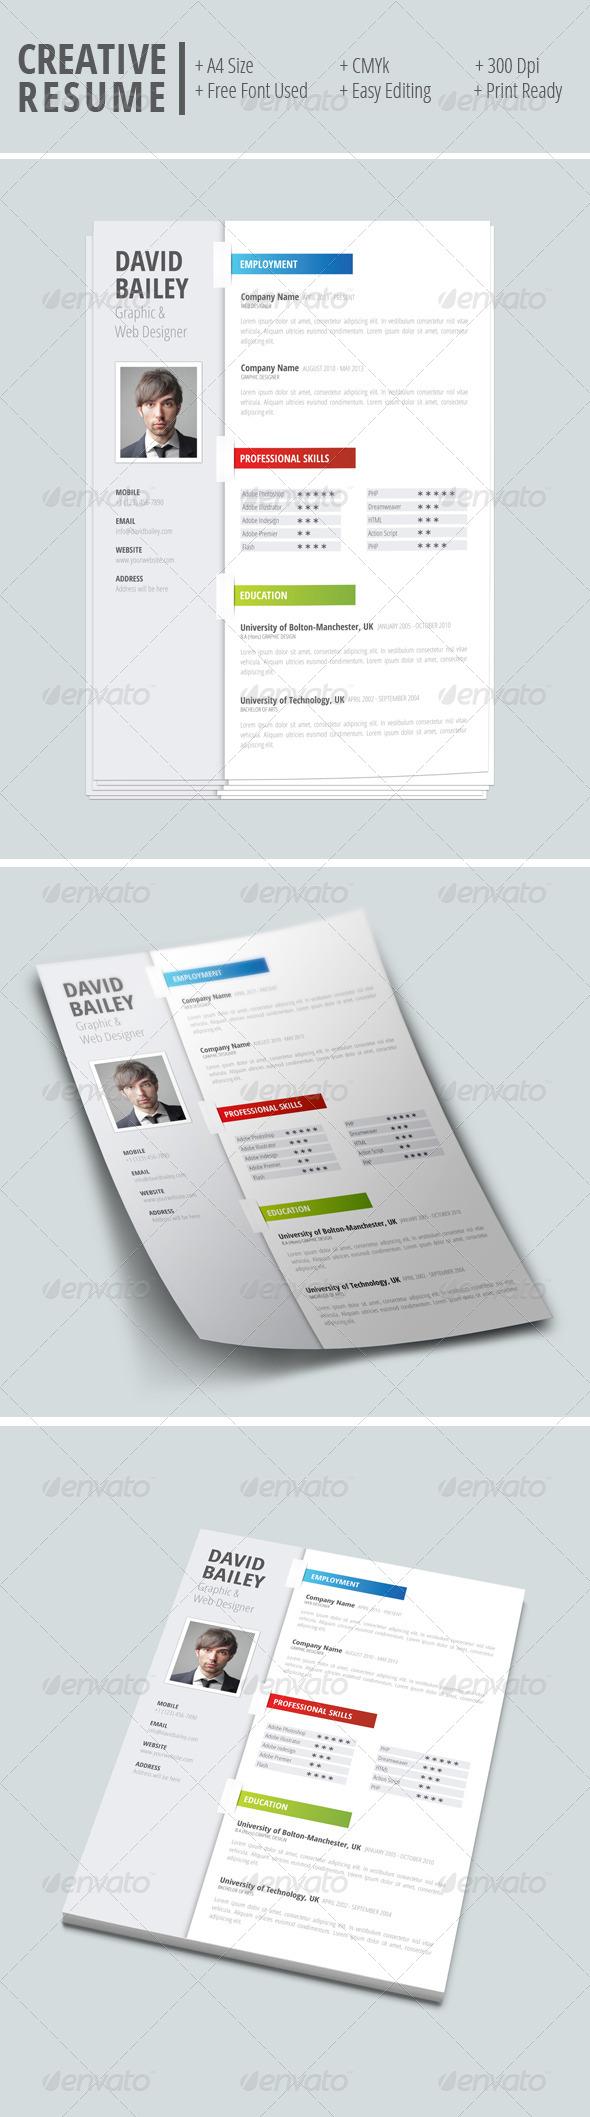 GraphicRiver Creative Resume 7940636